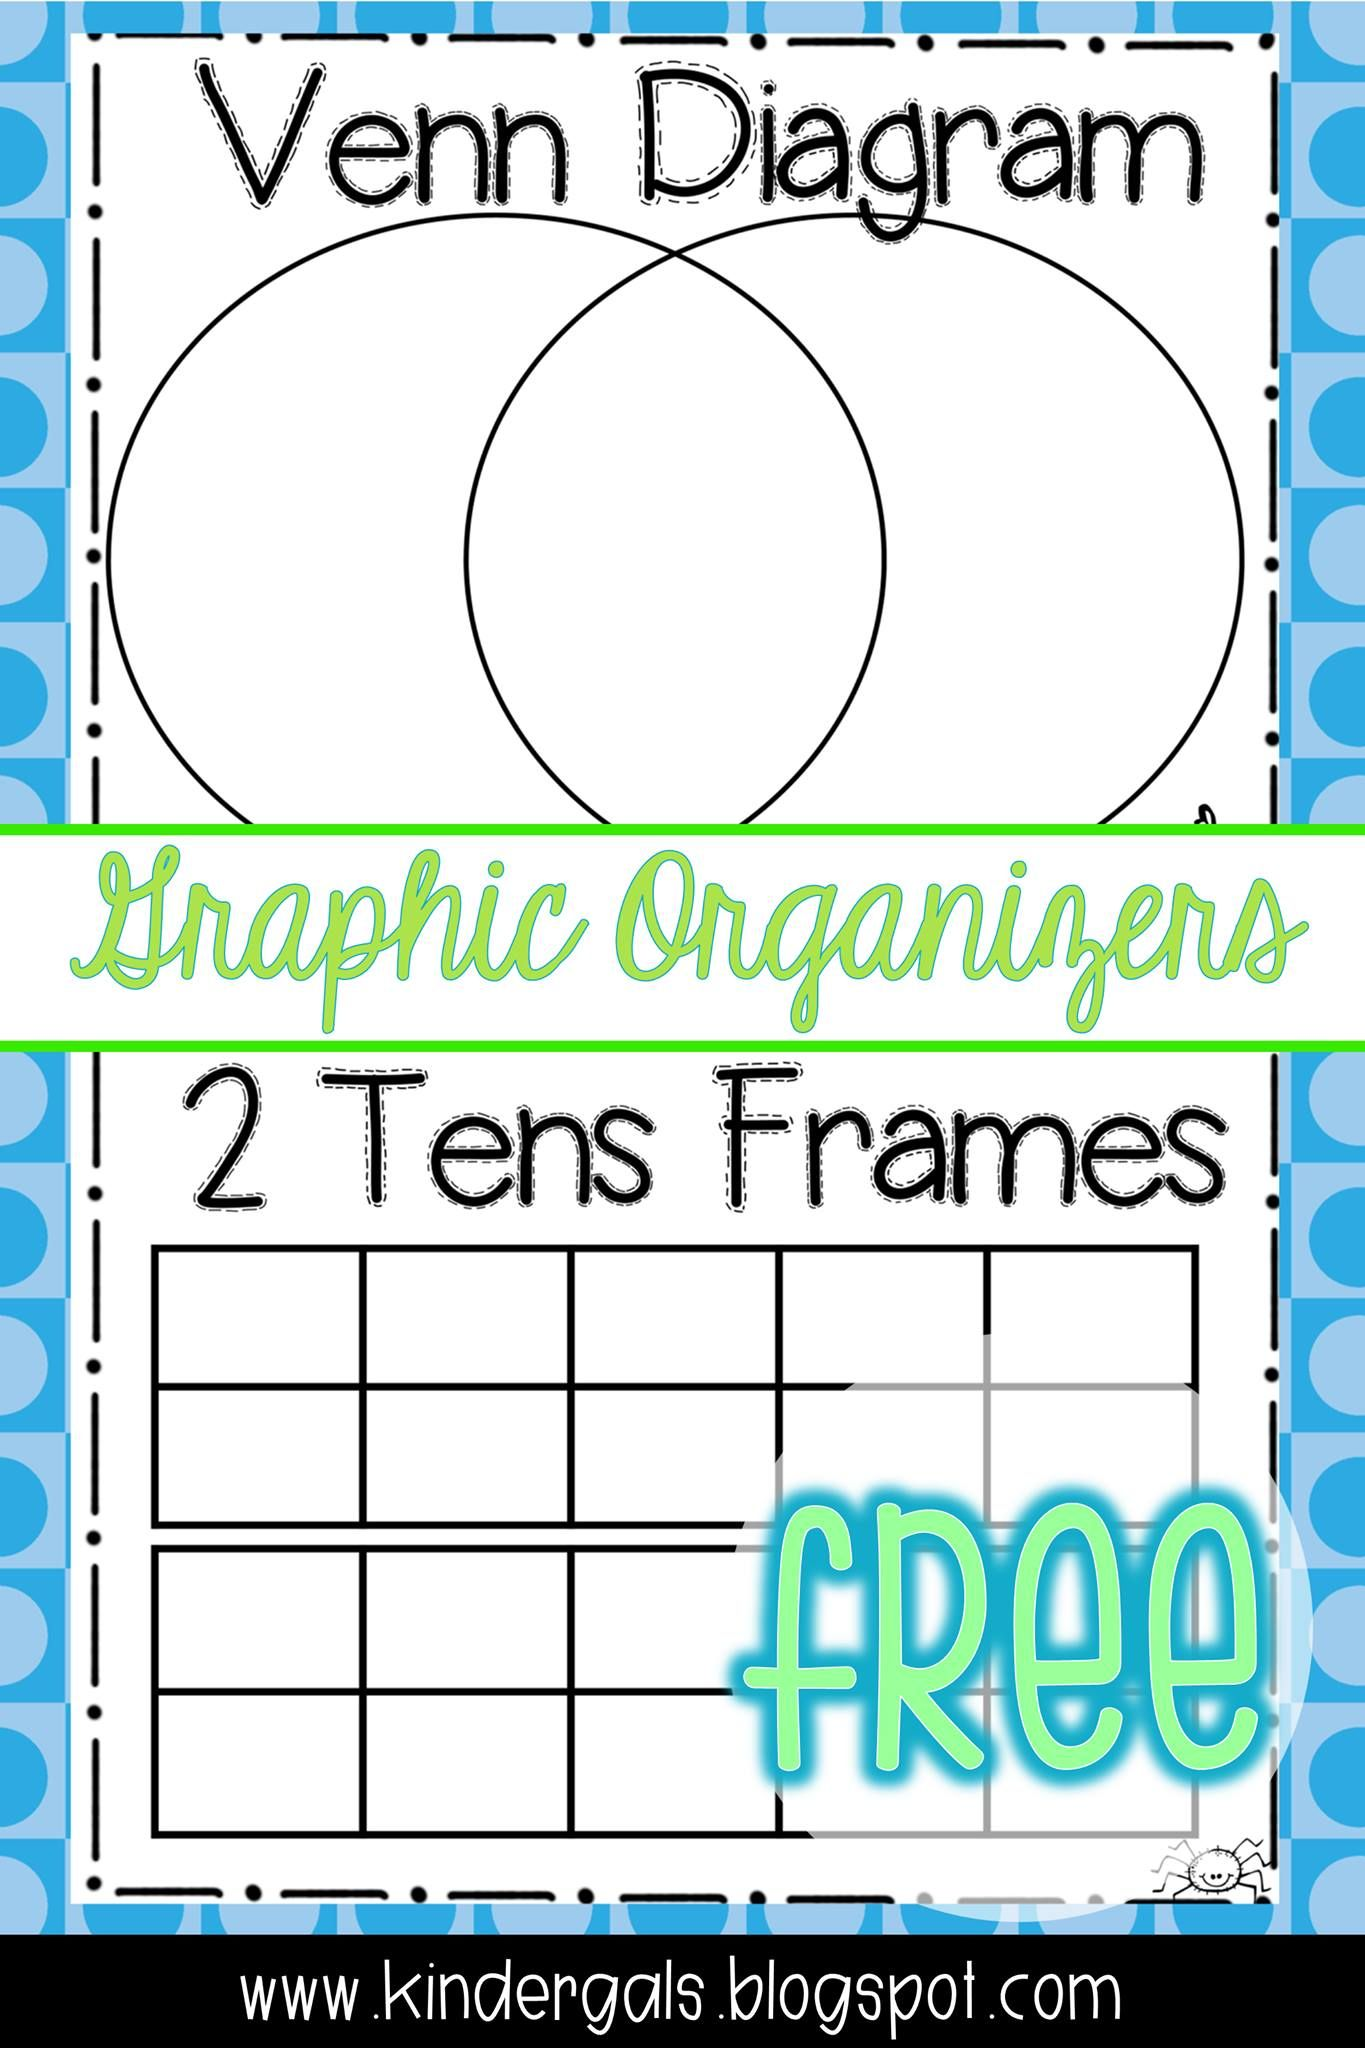 Venn Diagram And 2 Tens Frames